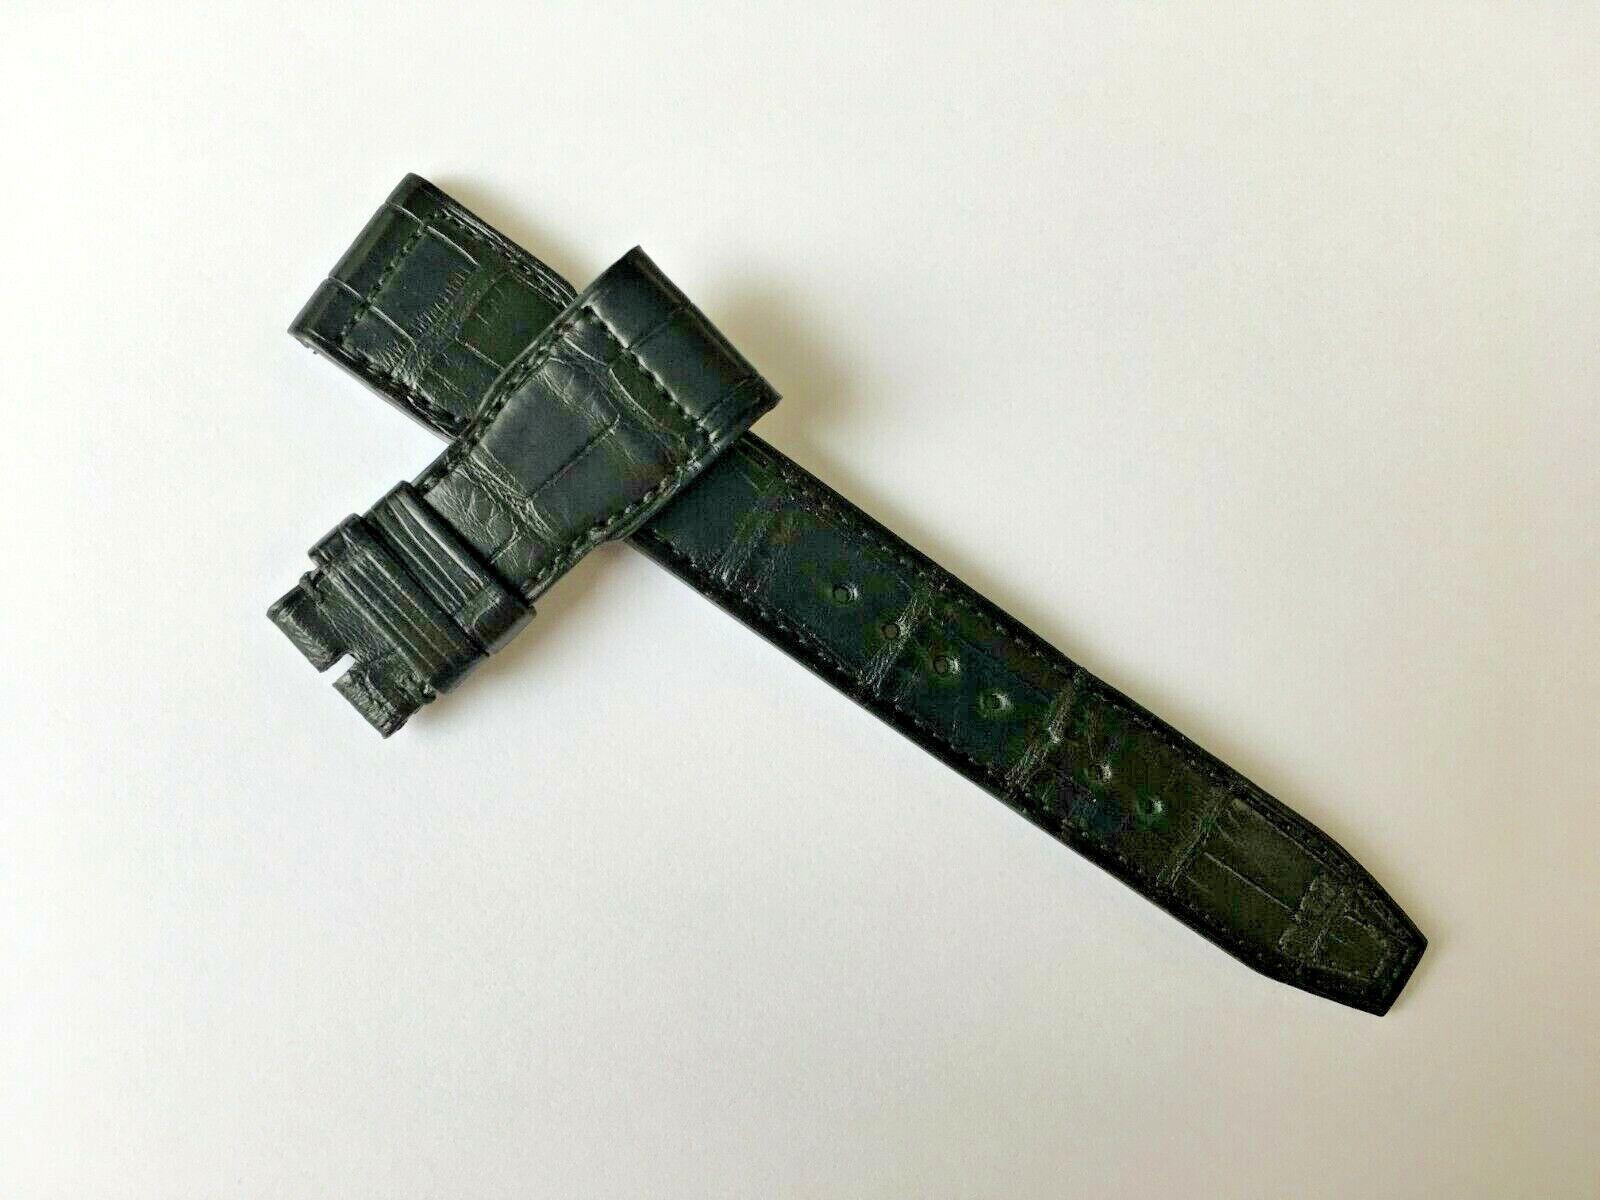 Original IWC 33667 Pilot Alligator Uhrenarmband Schwarz 22 mm x 18 mm